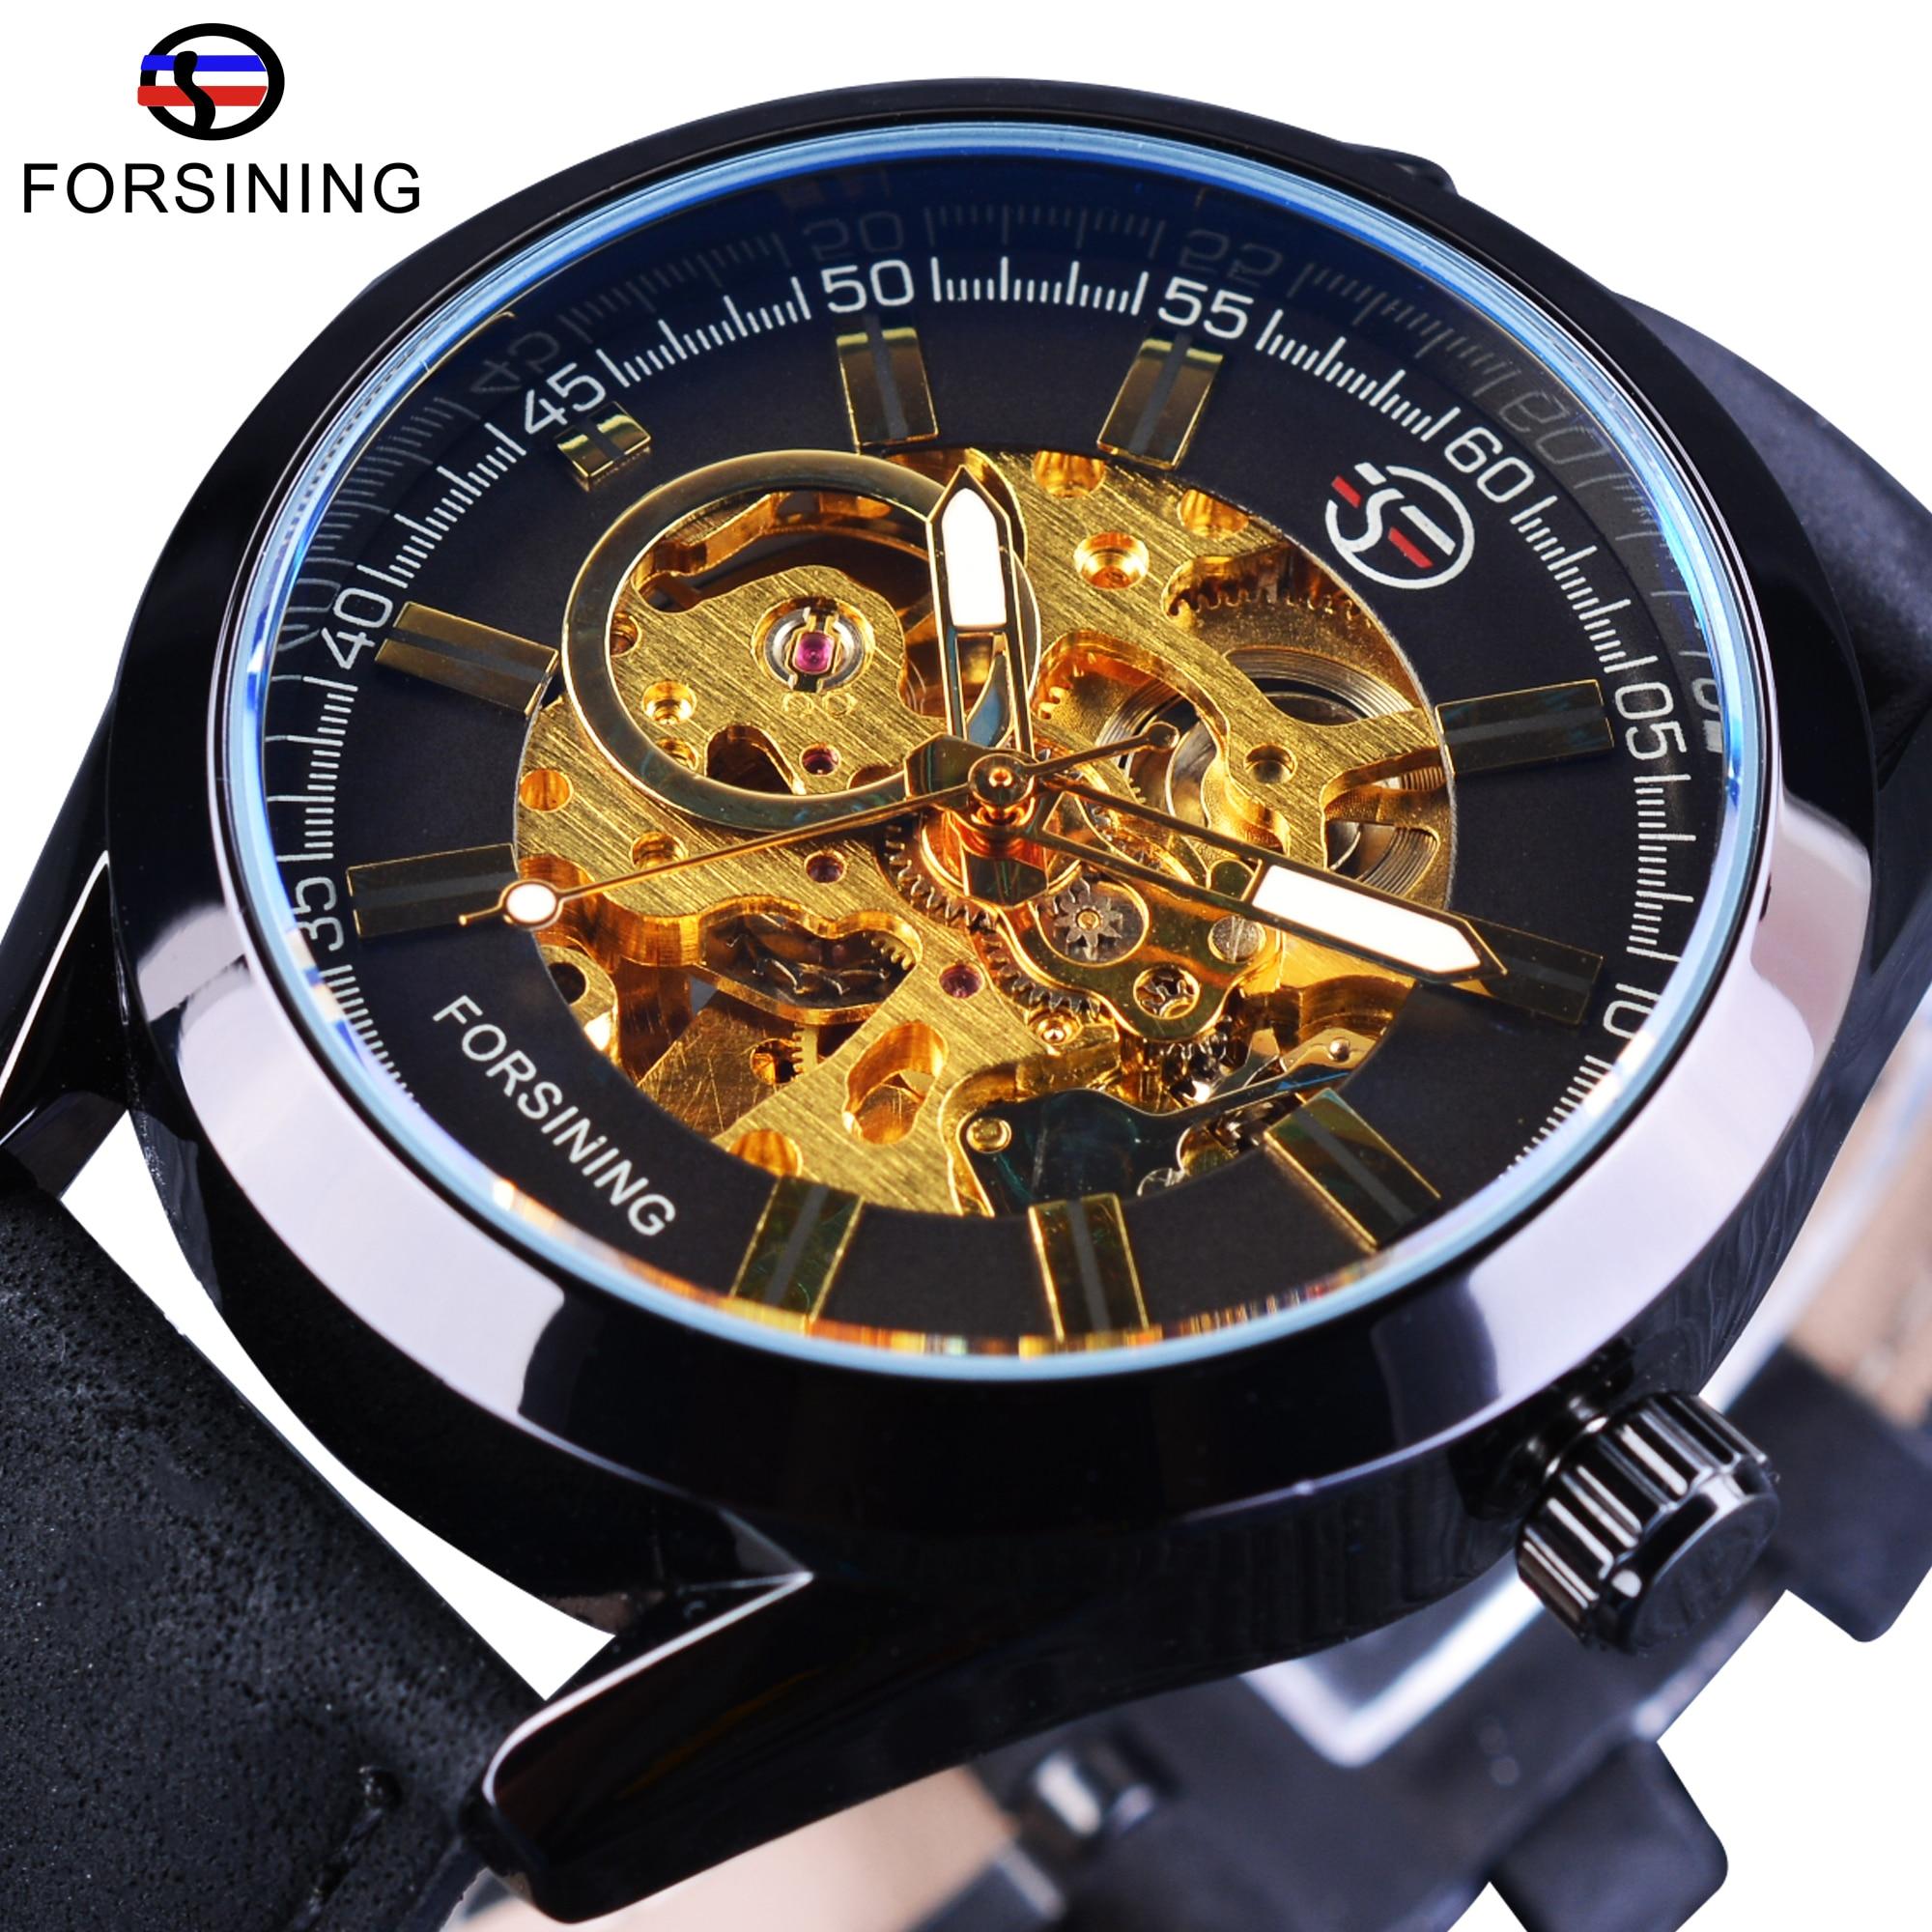 Forsining Casual Sport Waterproof Steampunk Men Watches Top Brand Luxury Transparent Open Work Mechanical Automatic Wrist Watch